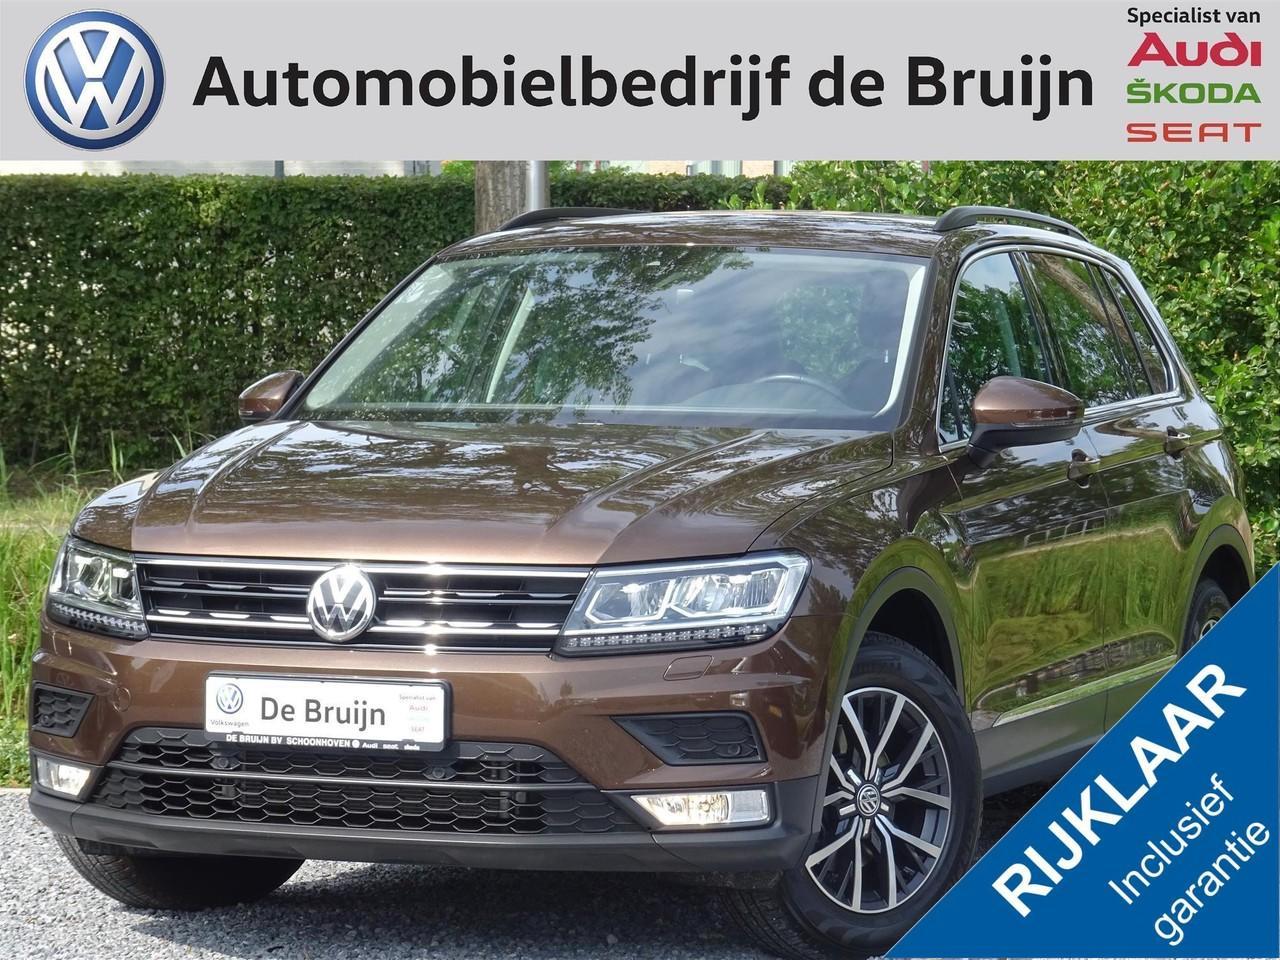 Volkswagen Tiguan Comfortline tsi 150pk dsg (trekhaak,led,clima,lm)